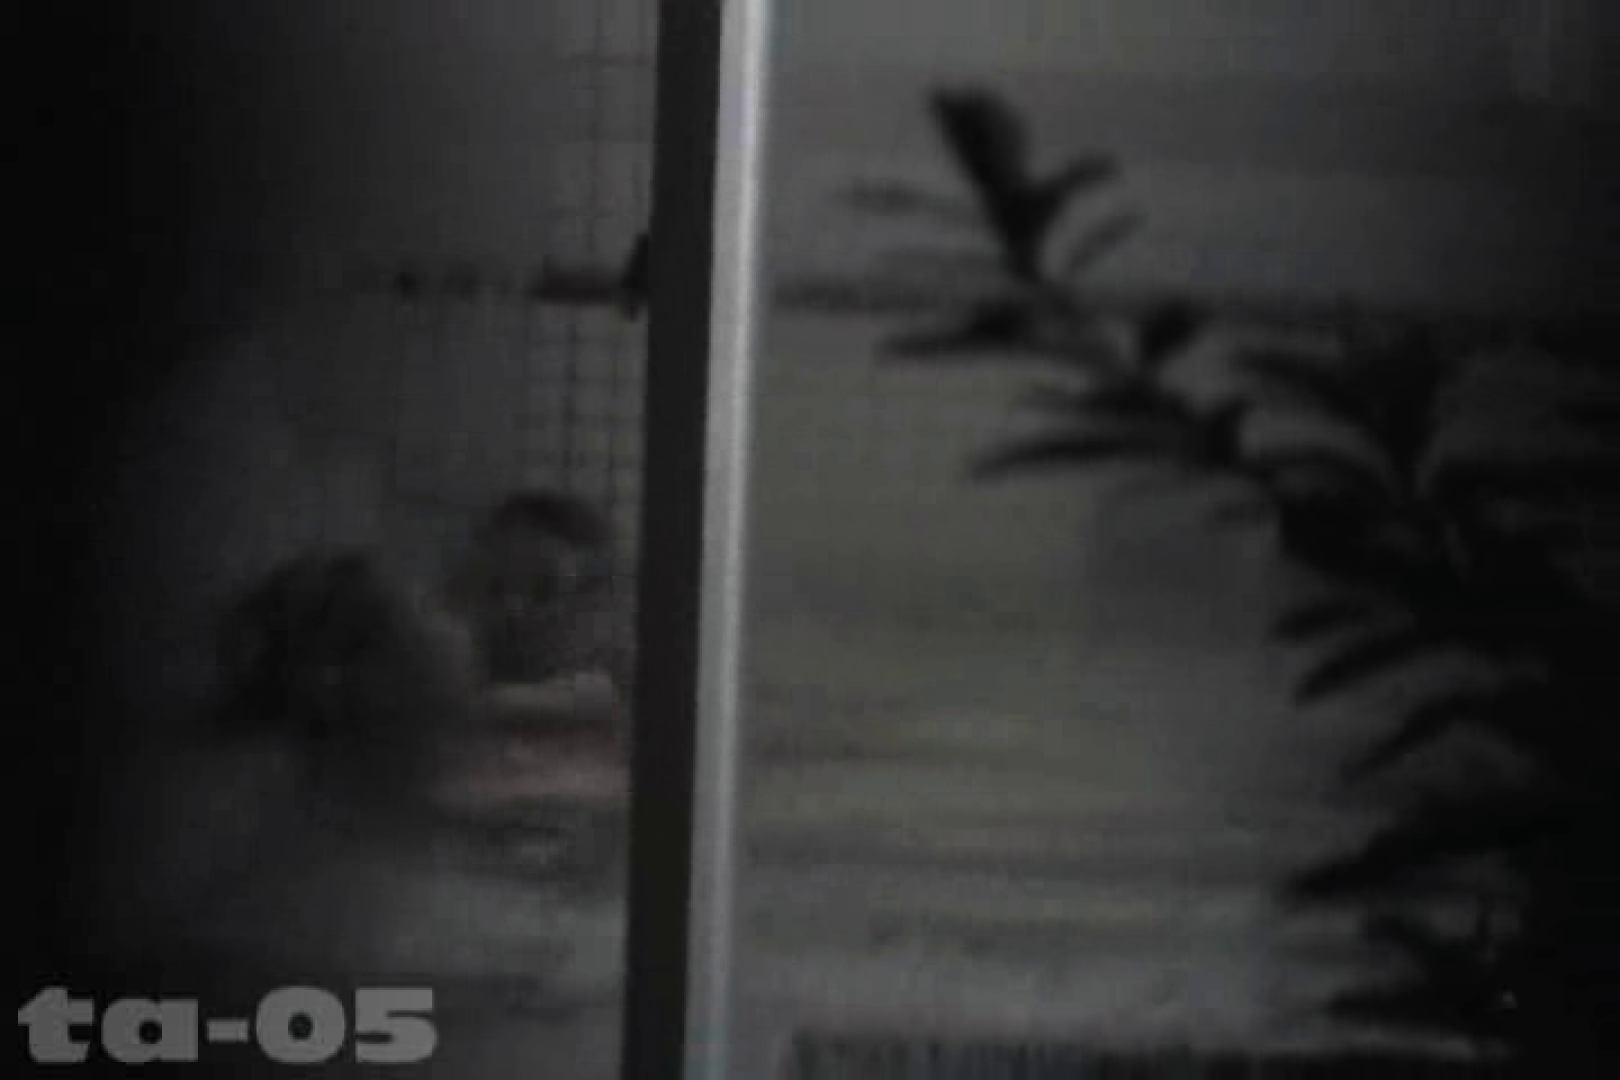 合宿ホテル女風呂盗撮高画質版 Vol.05 合宿中の女子 オメコ無修正動画無料 81PIX 53